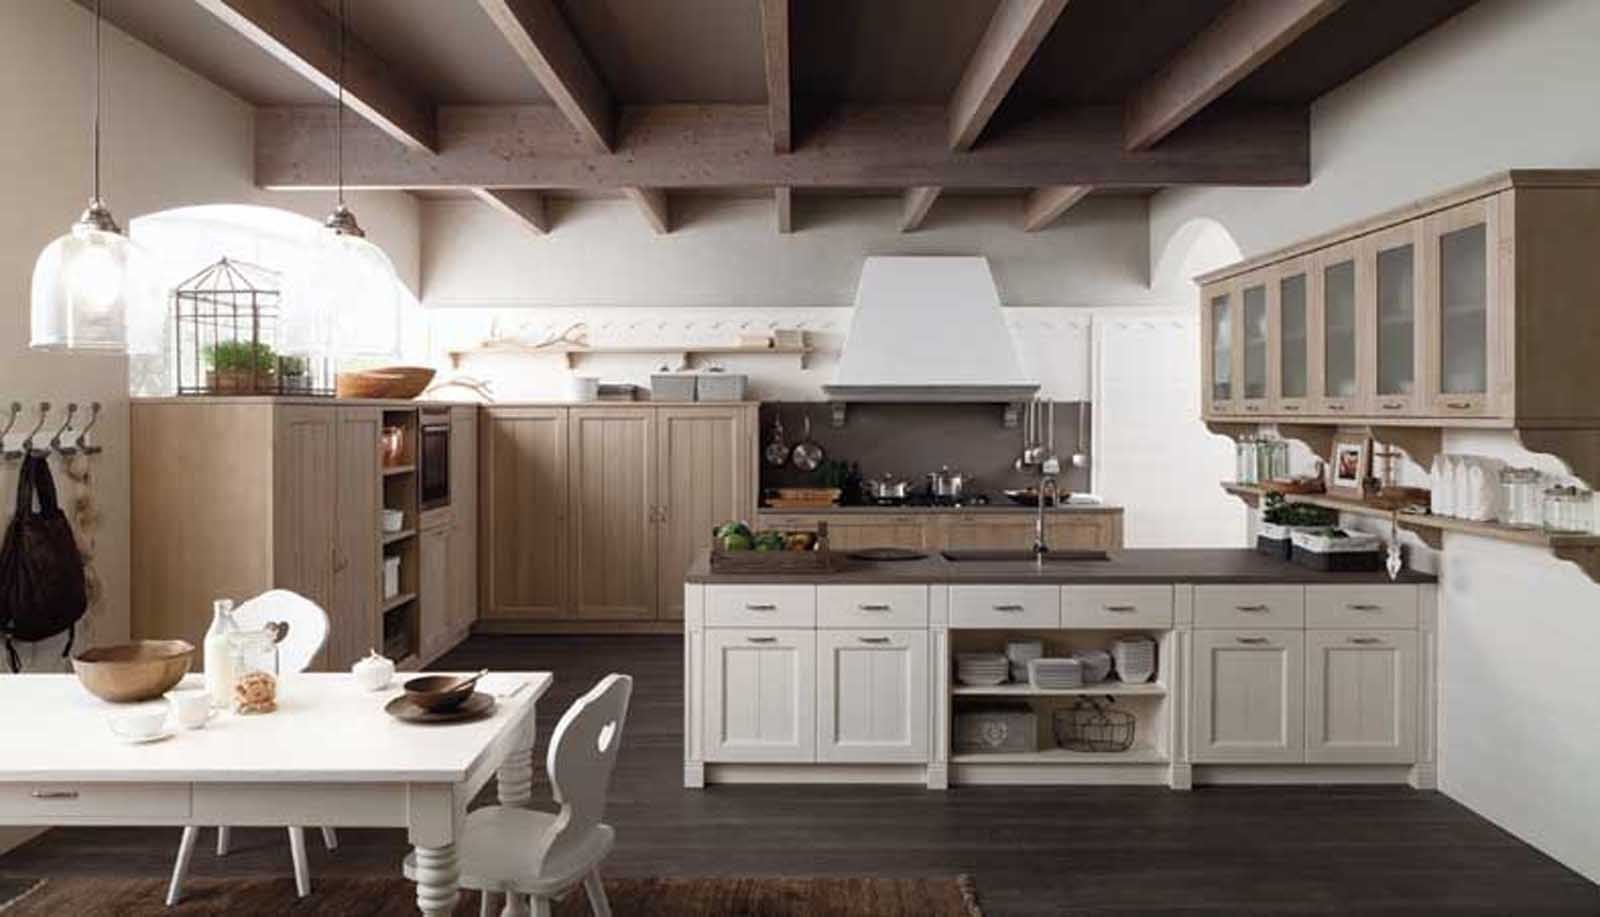 Cucine Moderne Scic Prezzi : Cucine cesar rivenditori. Cucine ...